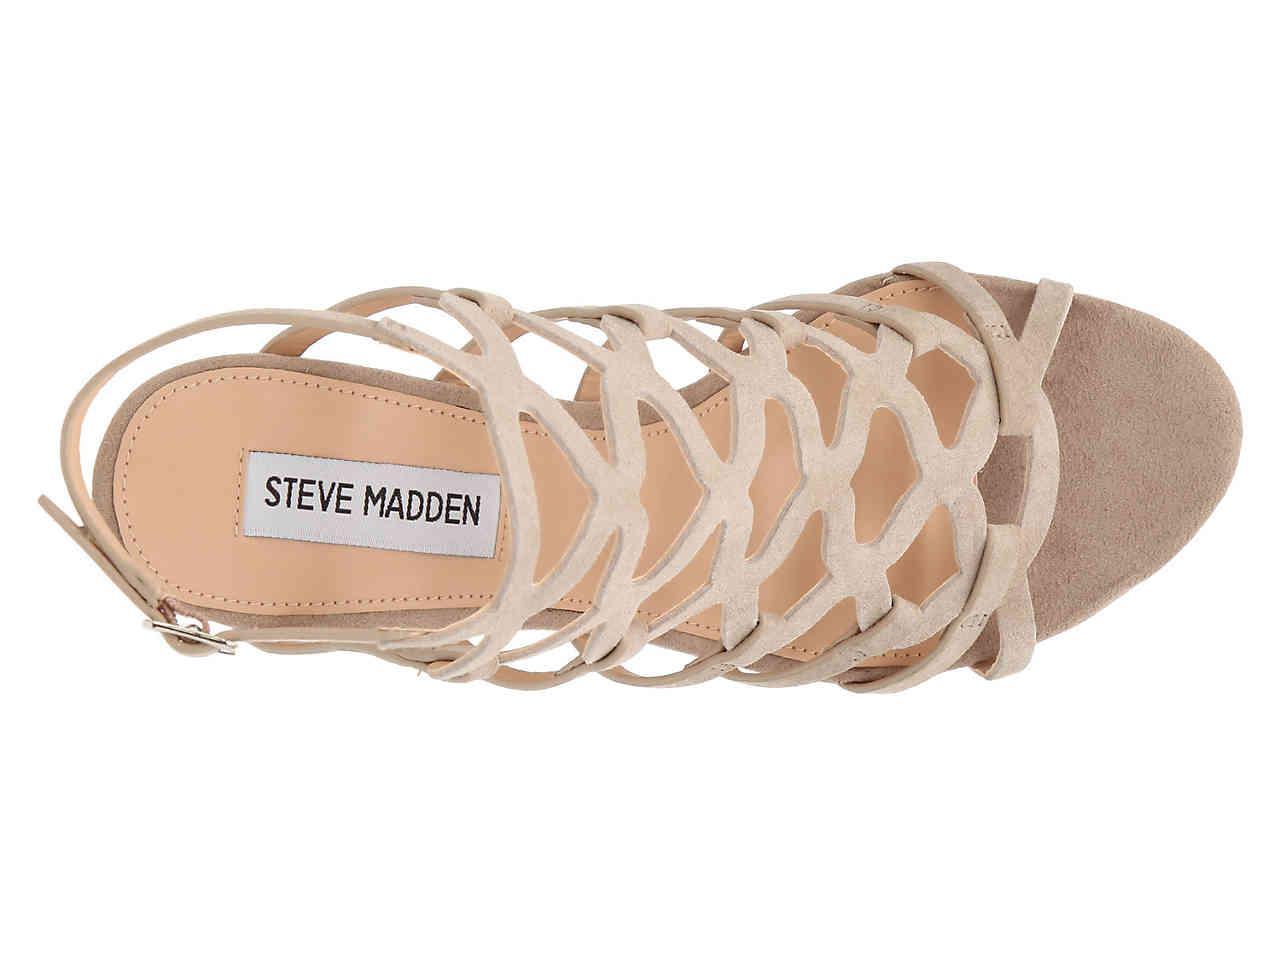 60a0a19d0cc Steve Madden - Multicolor Christina Wedge Sandal - Lyst. View fullscreen